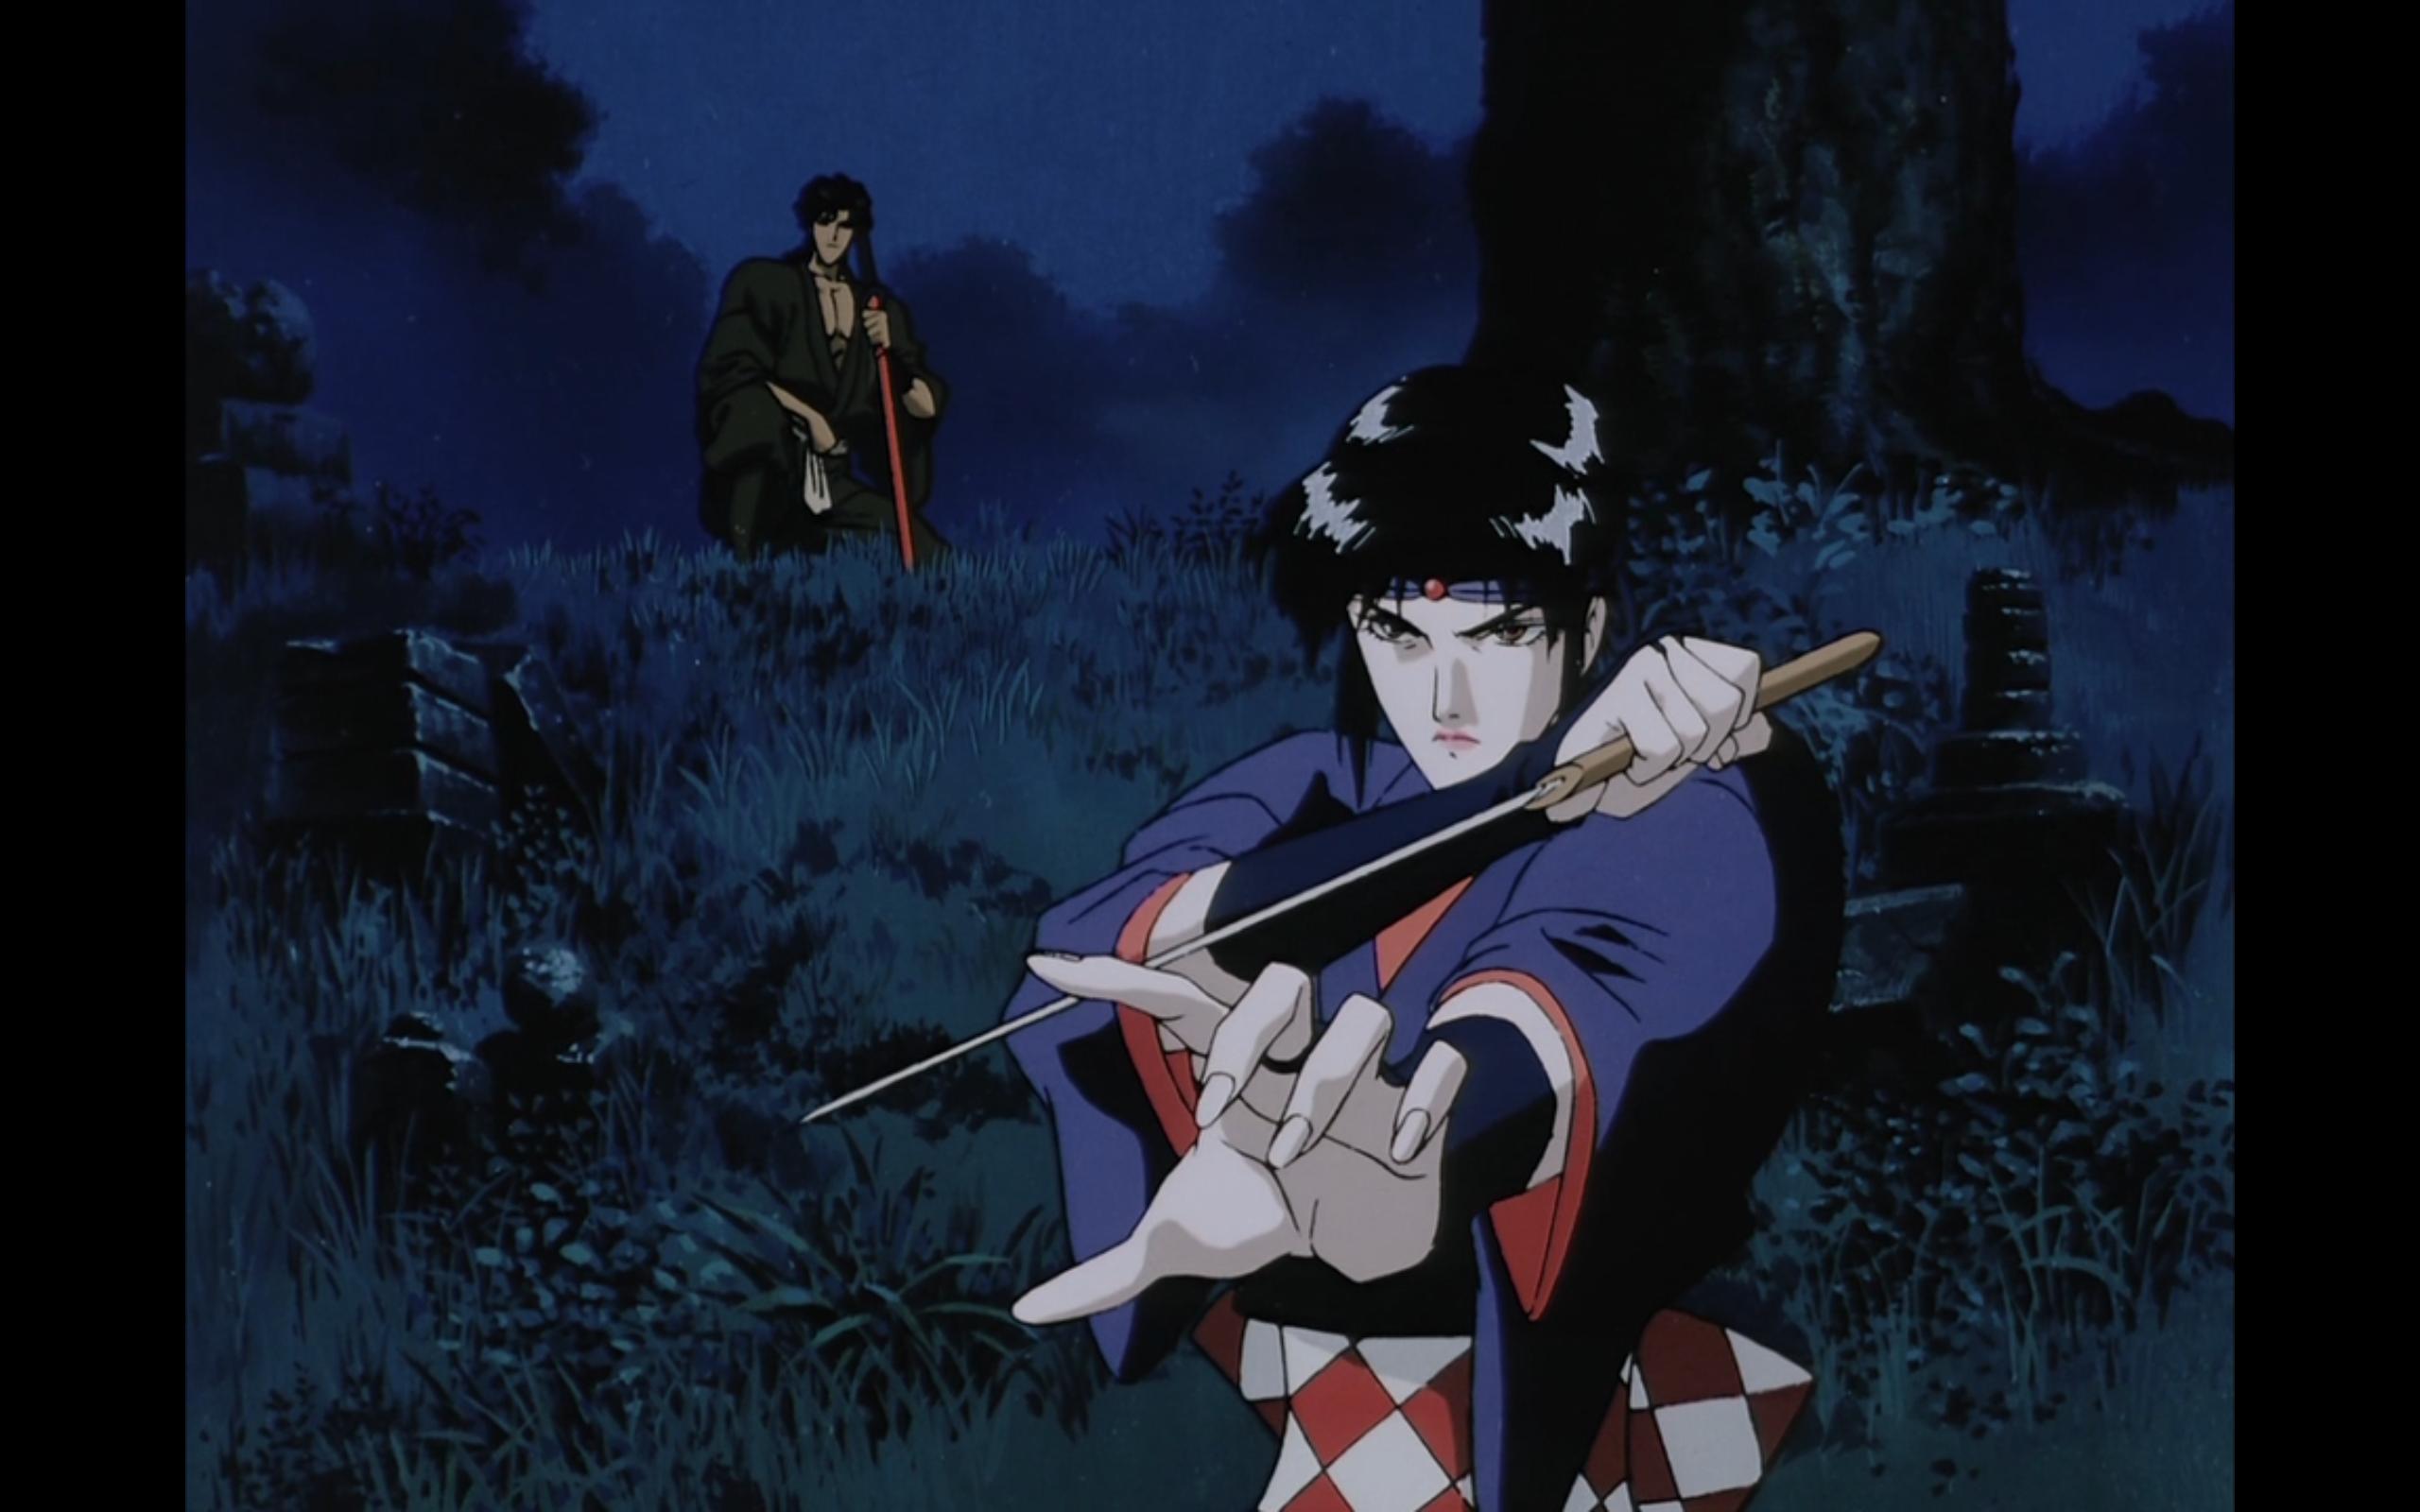 Ninja Scroll Ninja Scroll Anime Anime Anime Warrior